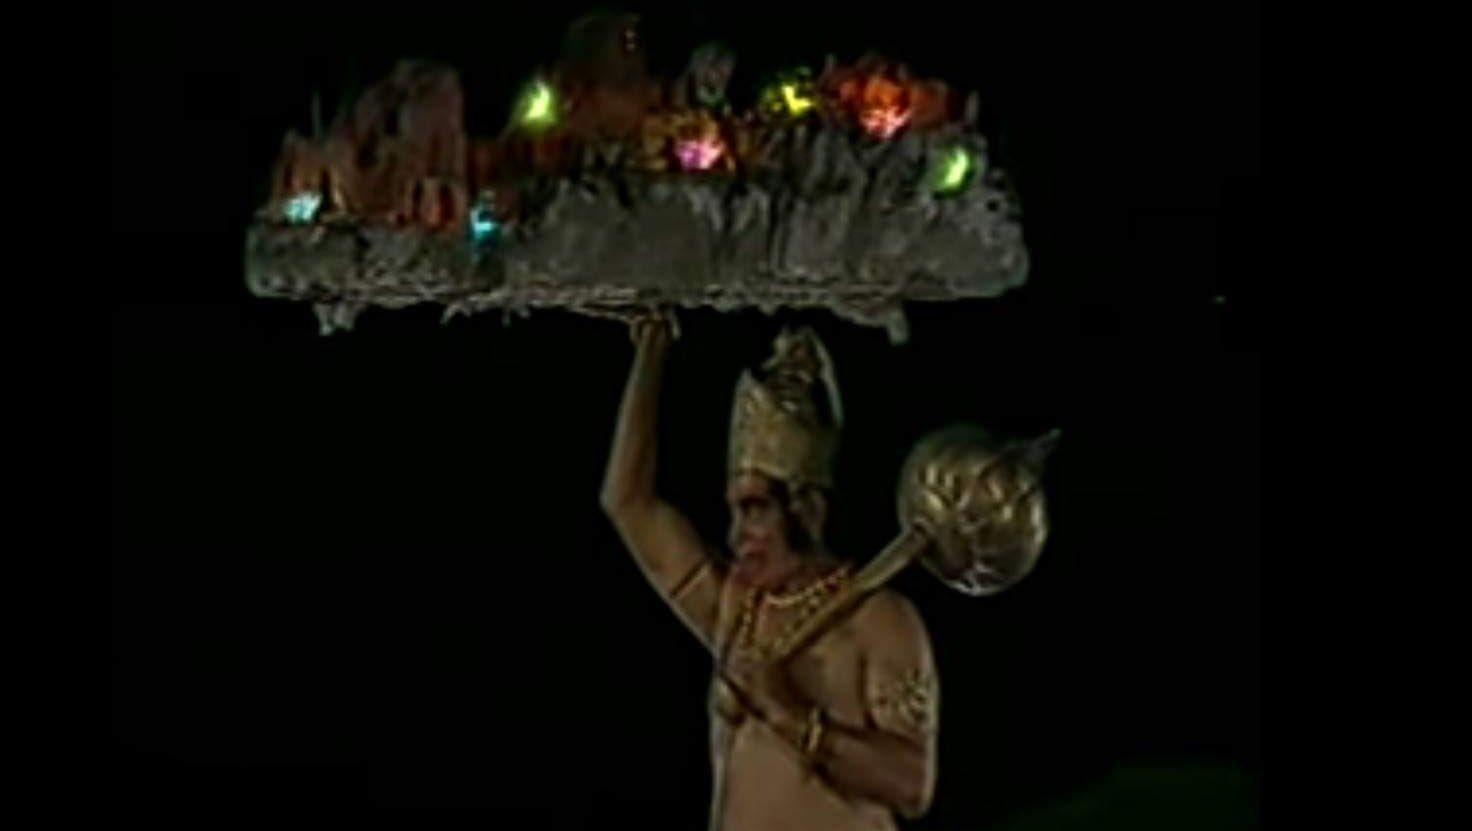 Hanuman lifting the mountain with Sanjeevani Booti